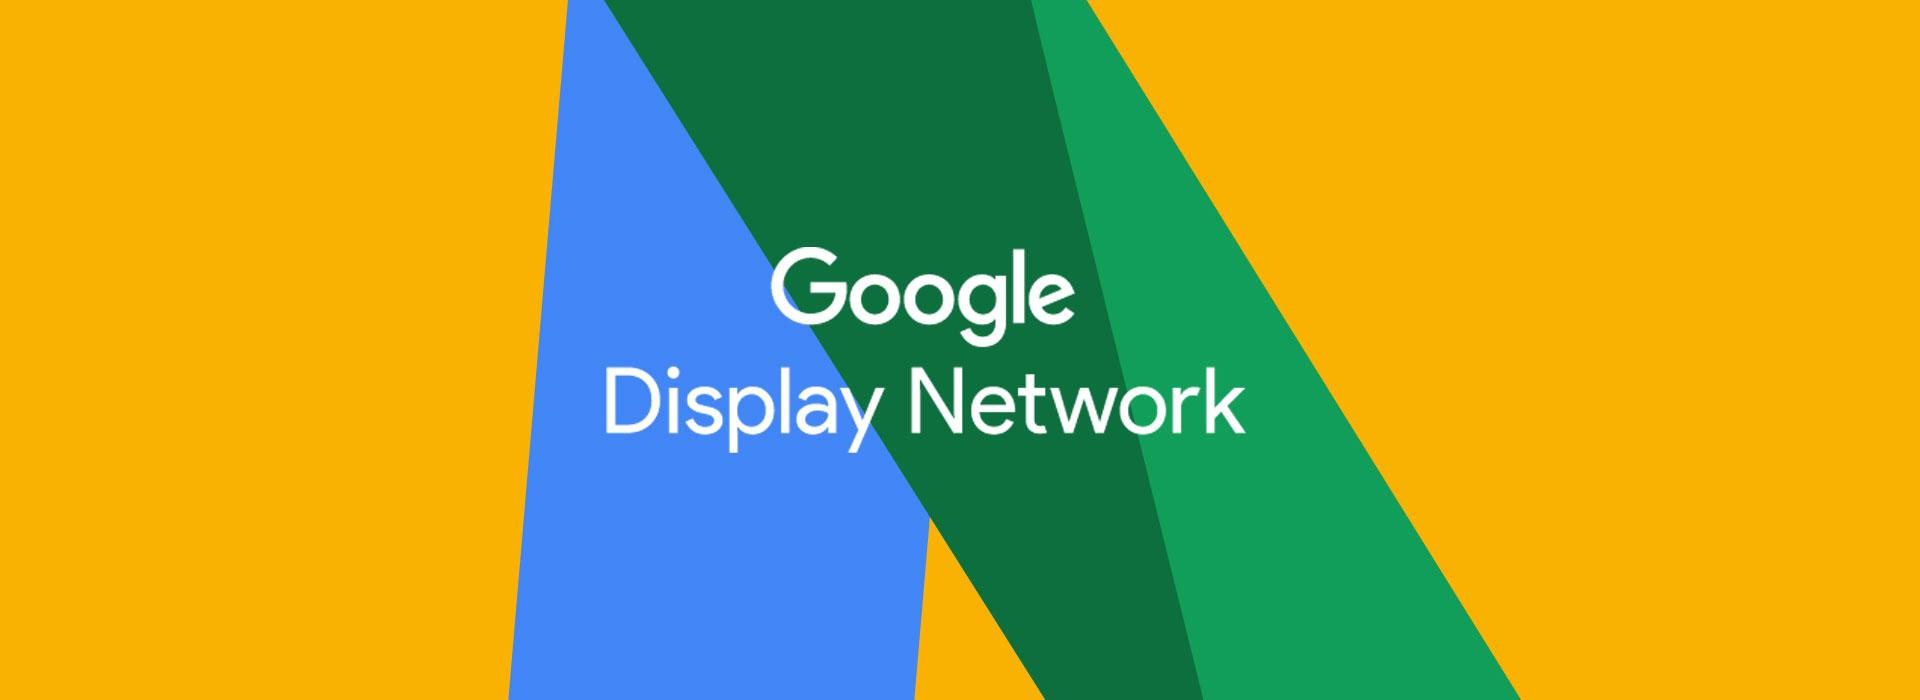 google-display-network-pic